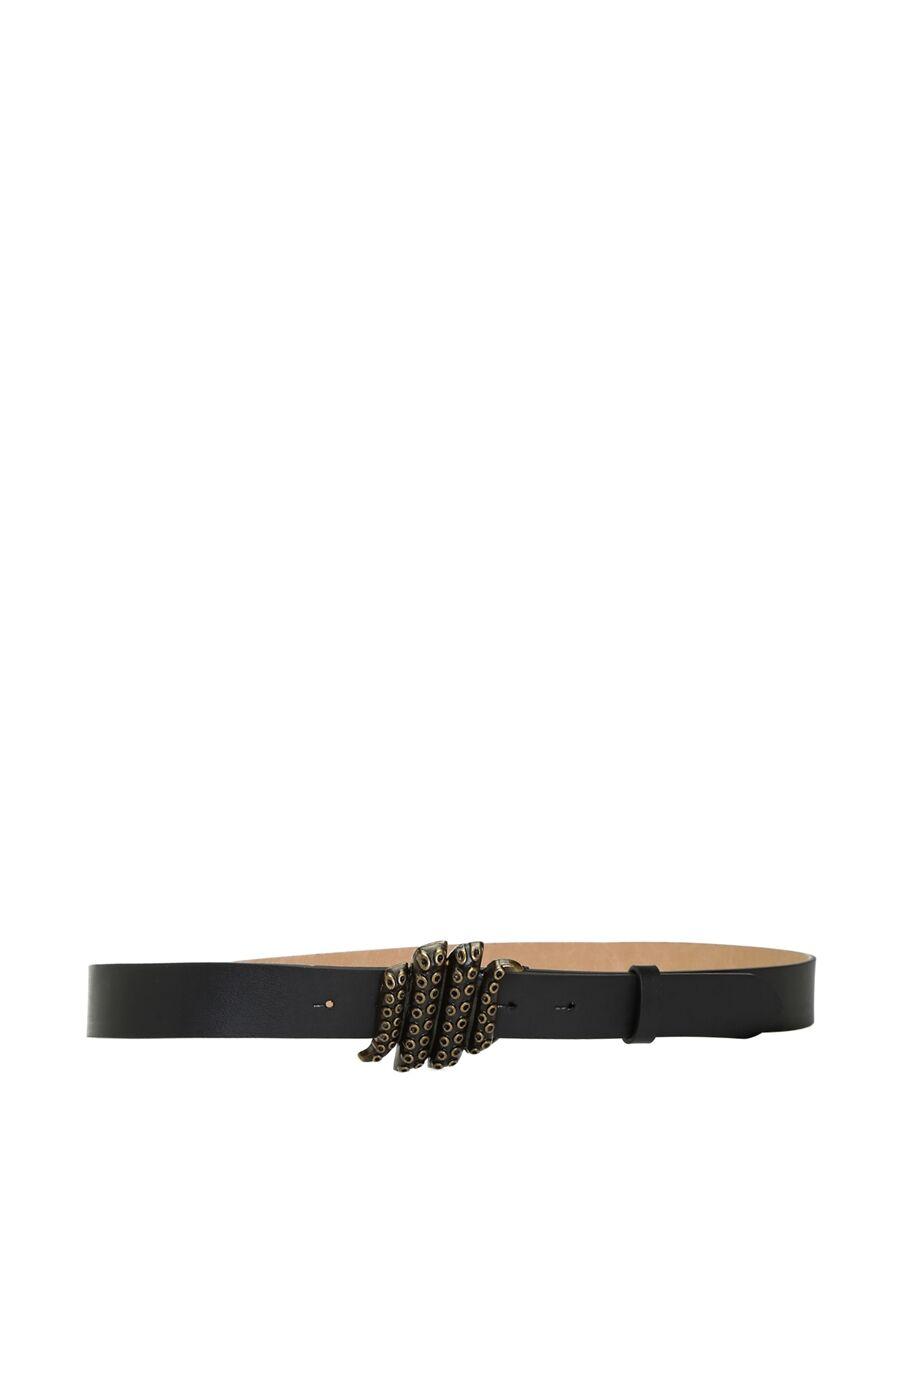 Ahtapot Tokalı Siyah Kemer